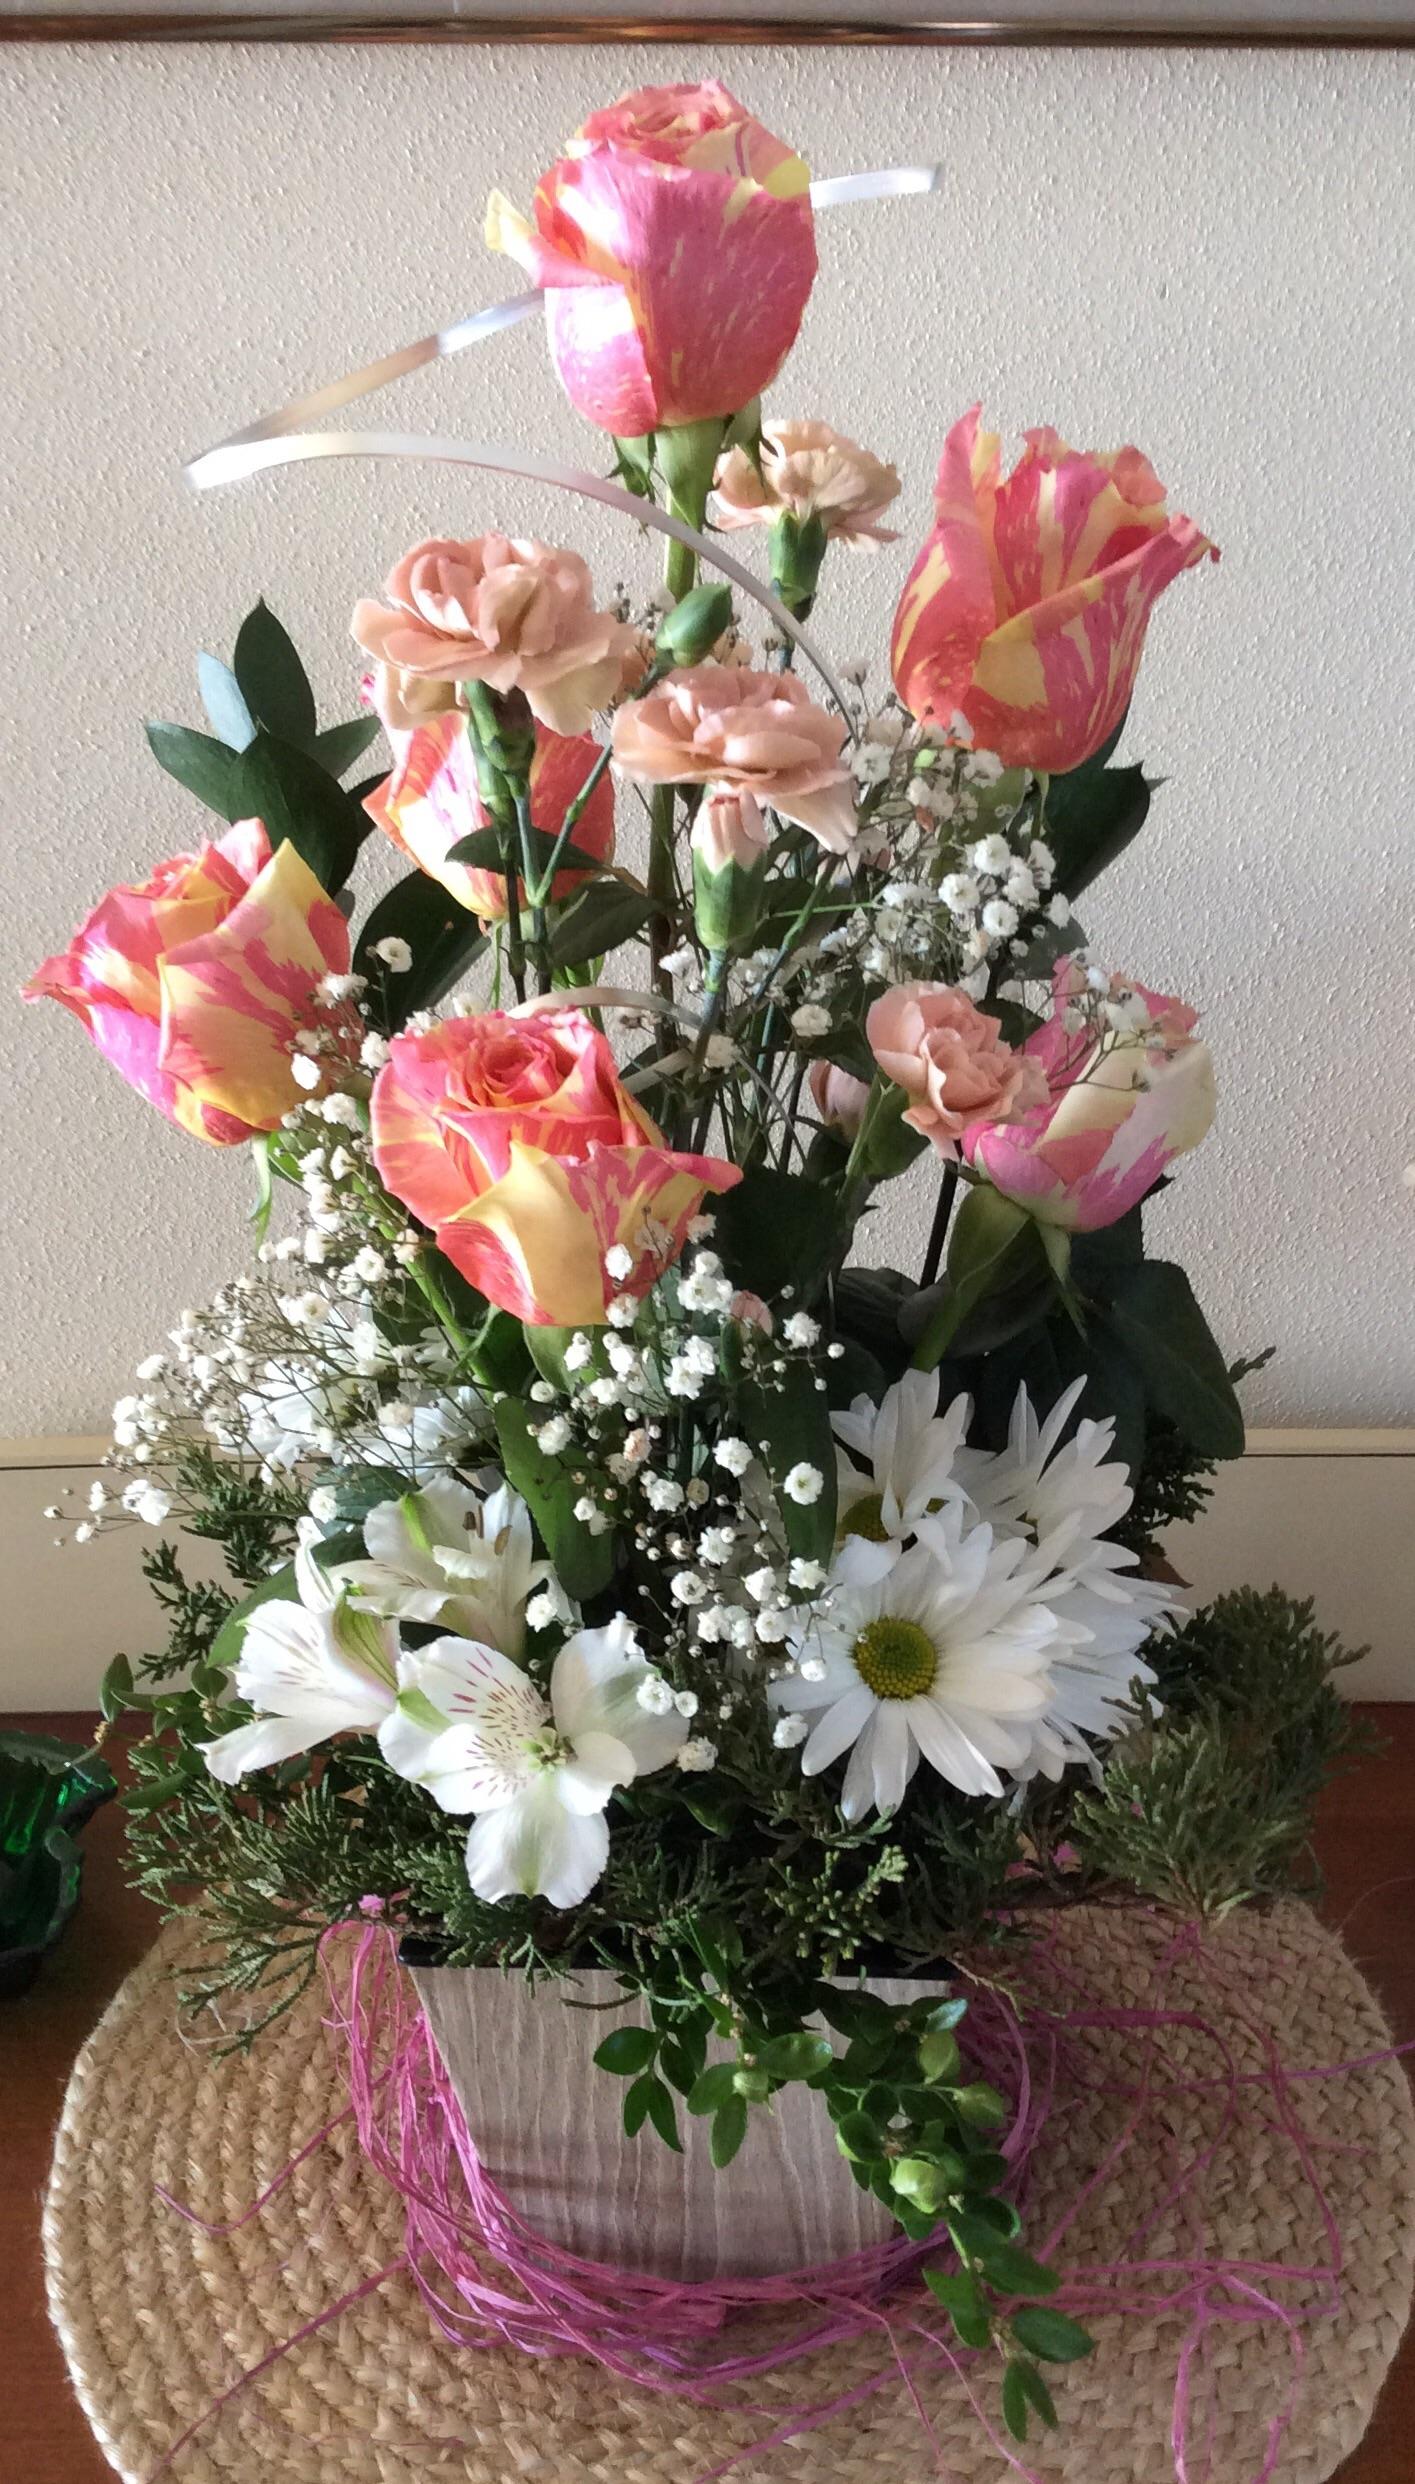 rose – Rose and Twig Floral Designs